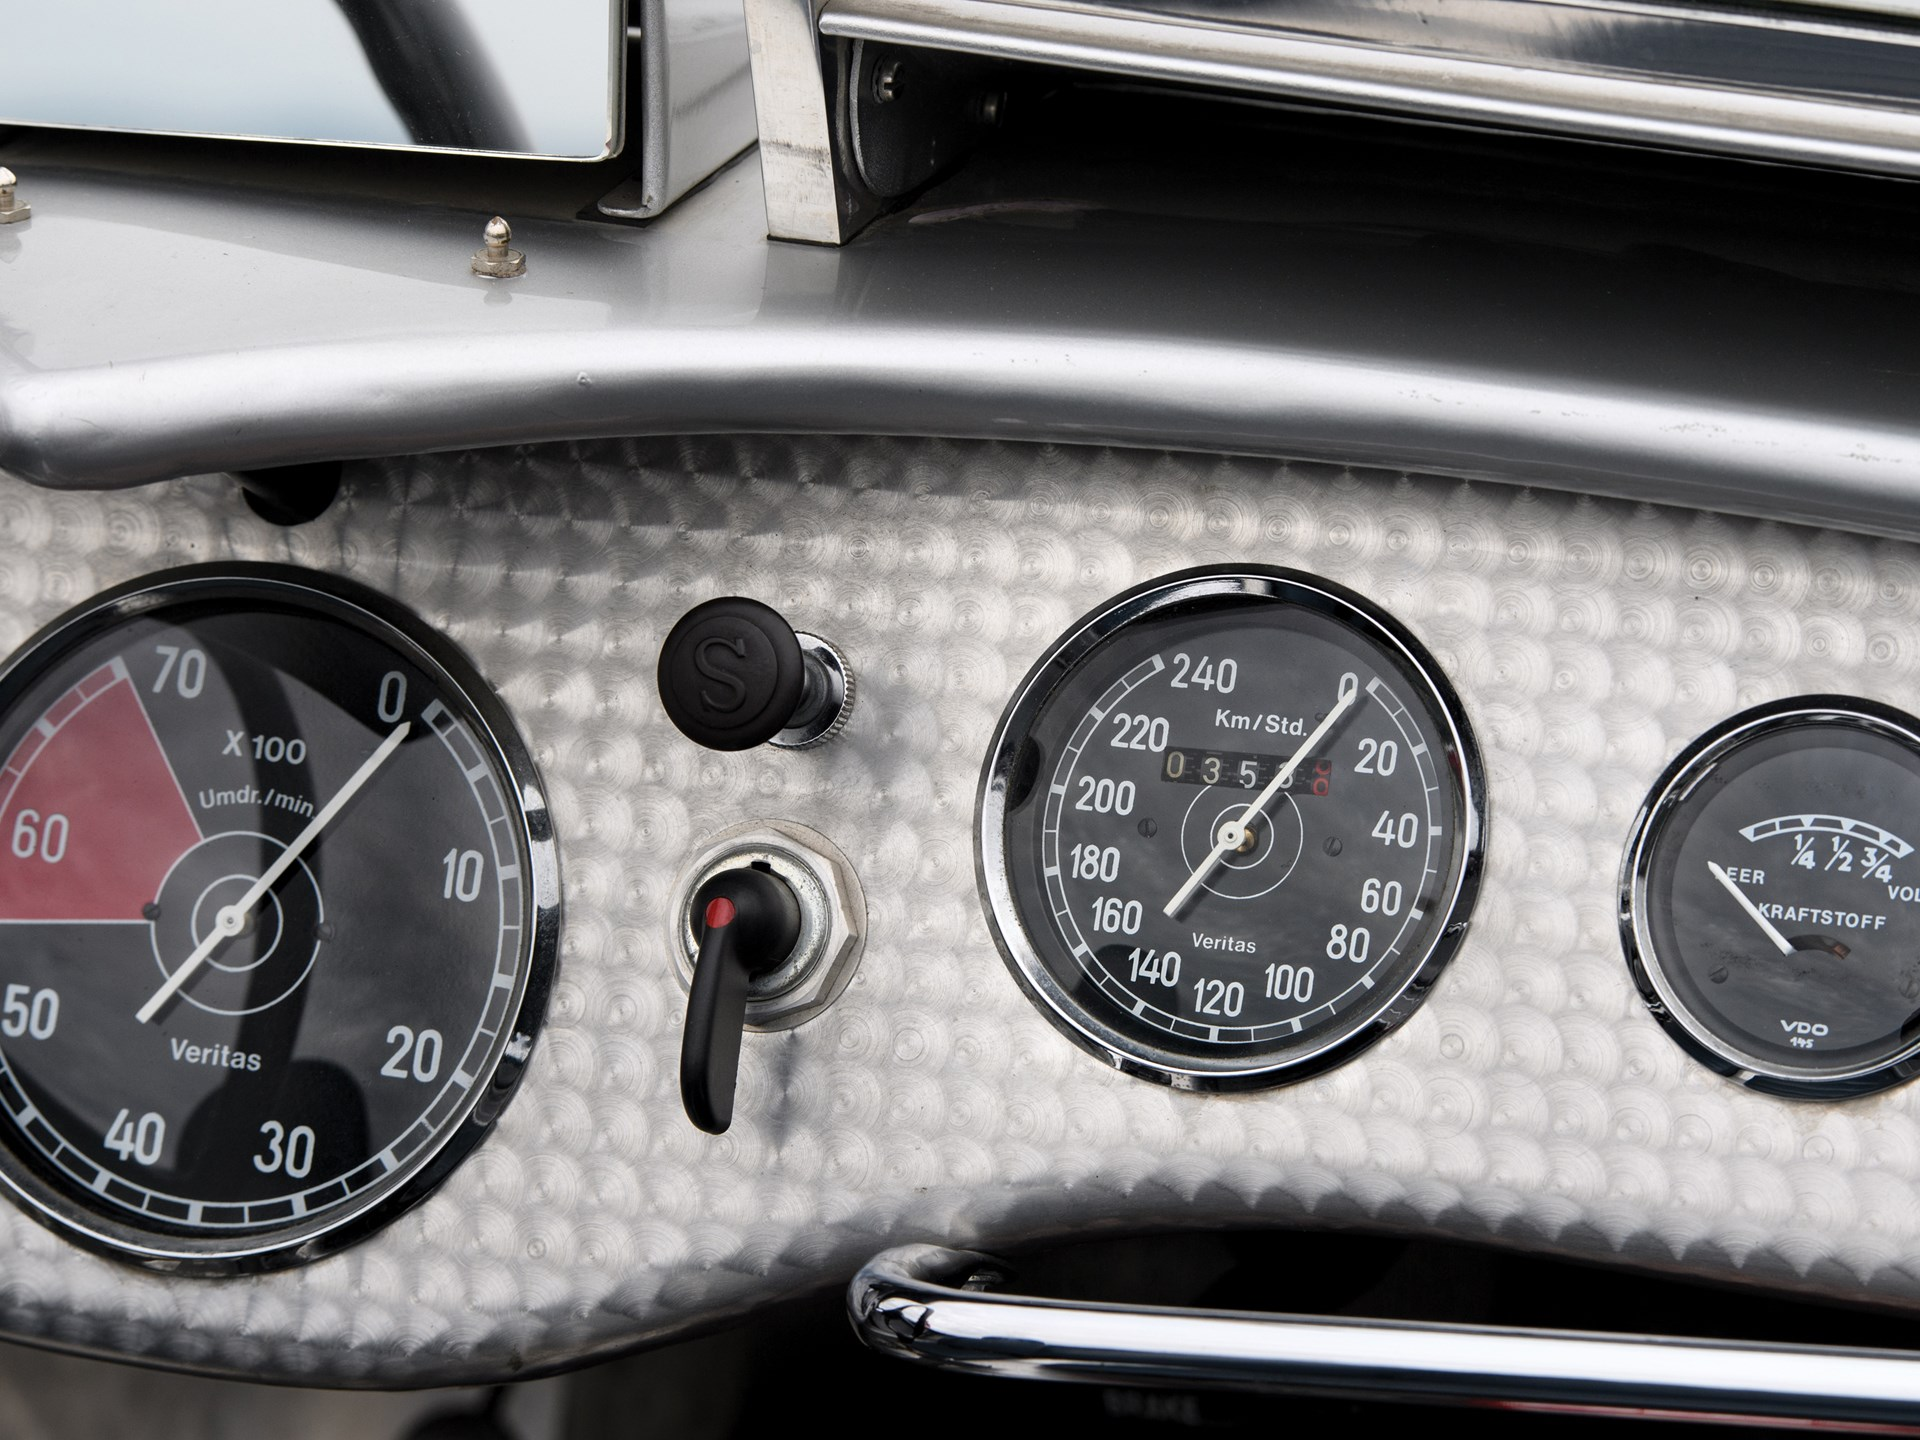 1949 Veritas BMW Rennsport